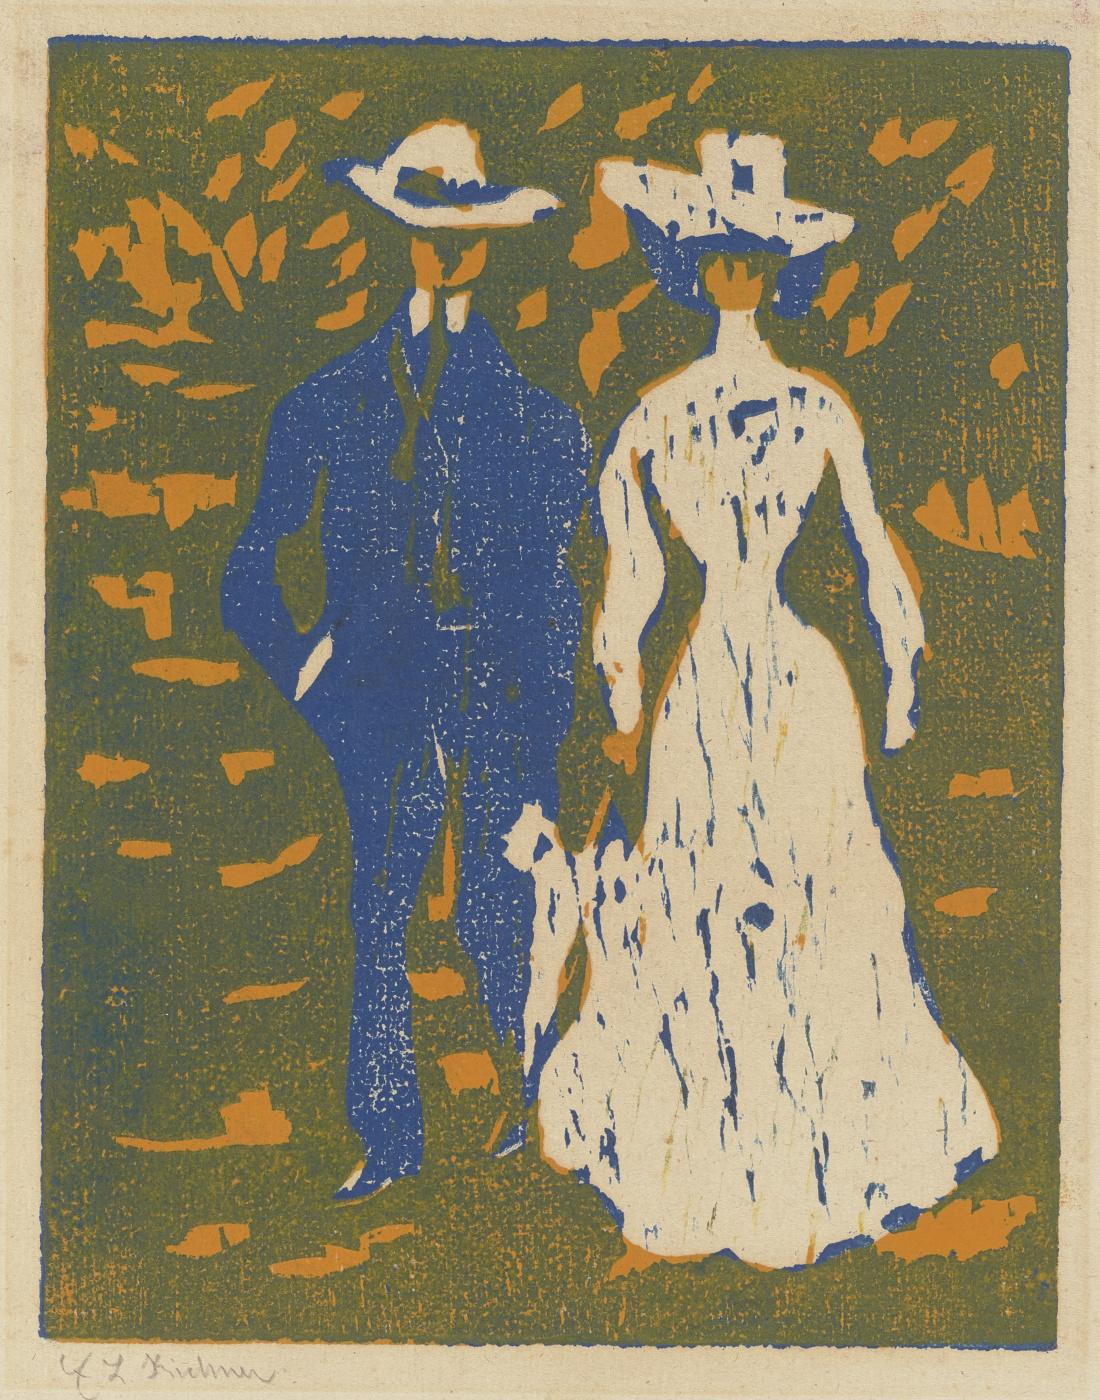 Ernst Ludwig Kirchner. Newlyweds